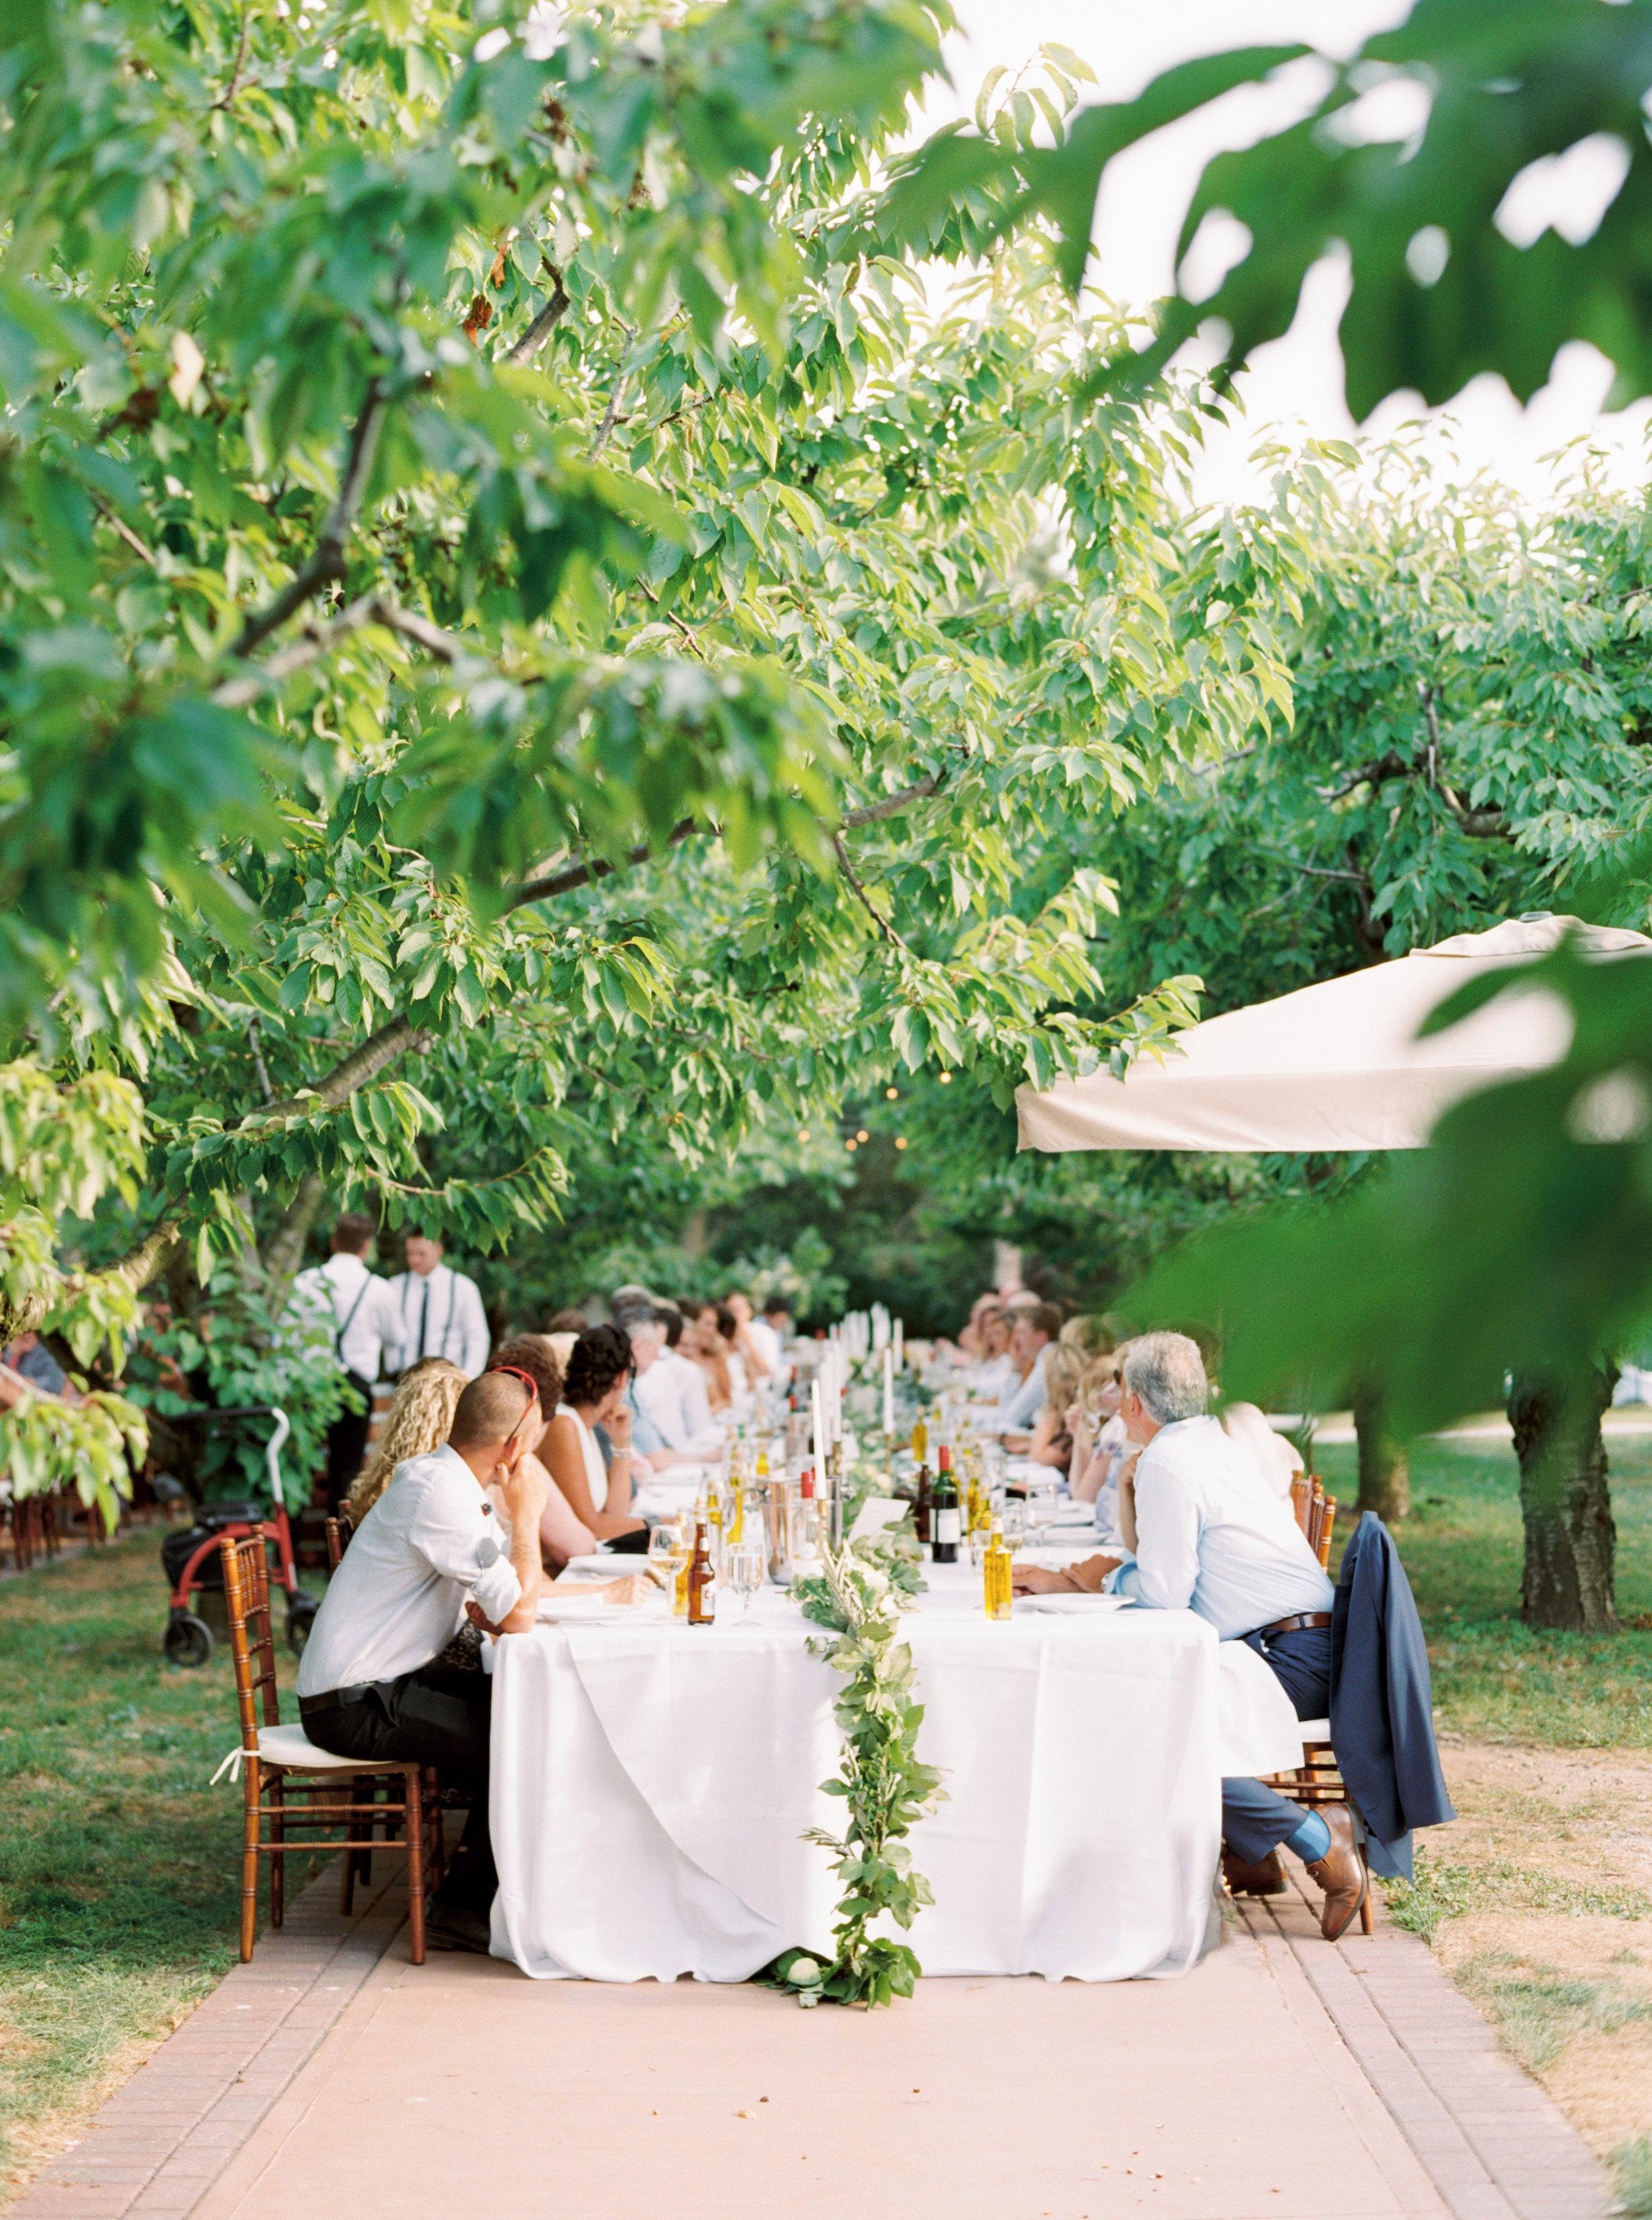 gracewood-kurtz-orchards-toronto-wedding-photographer-kurtz-film-richelle-hunter-cassandra-zac-dalpe-previews-25.jpg